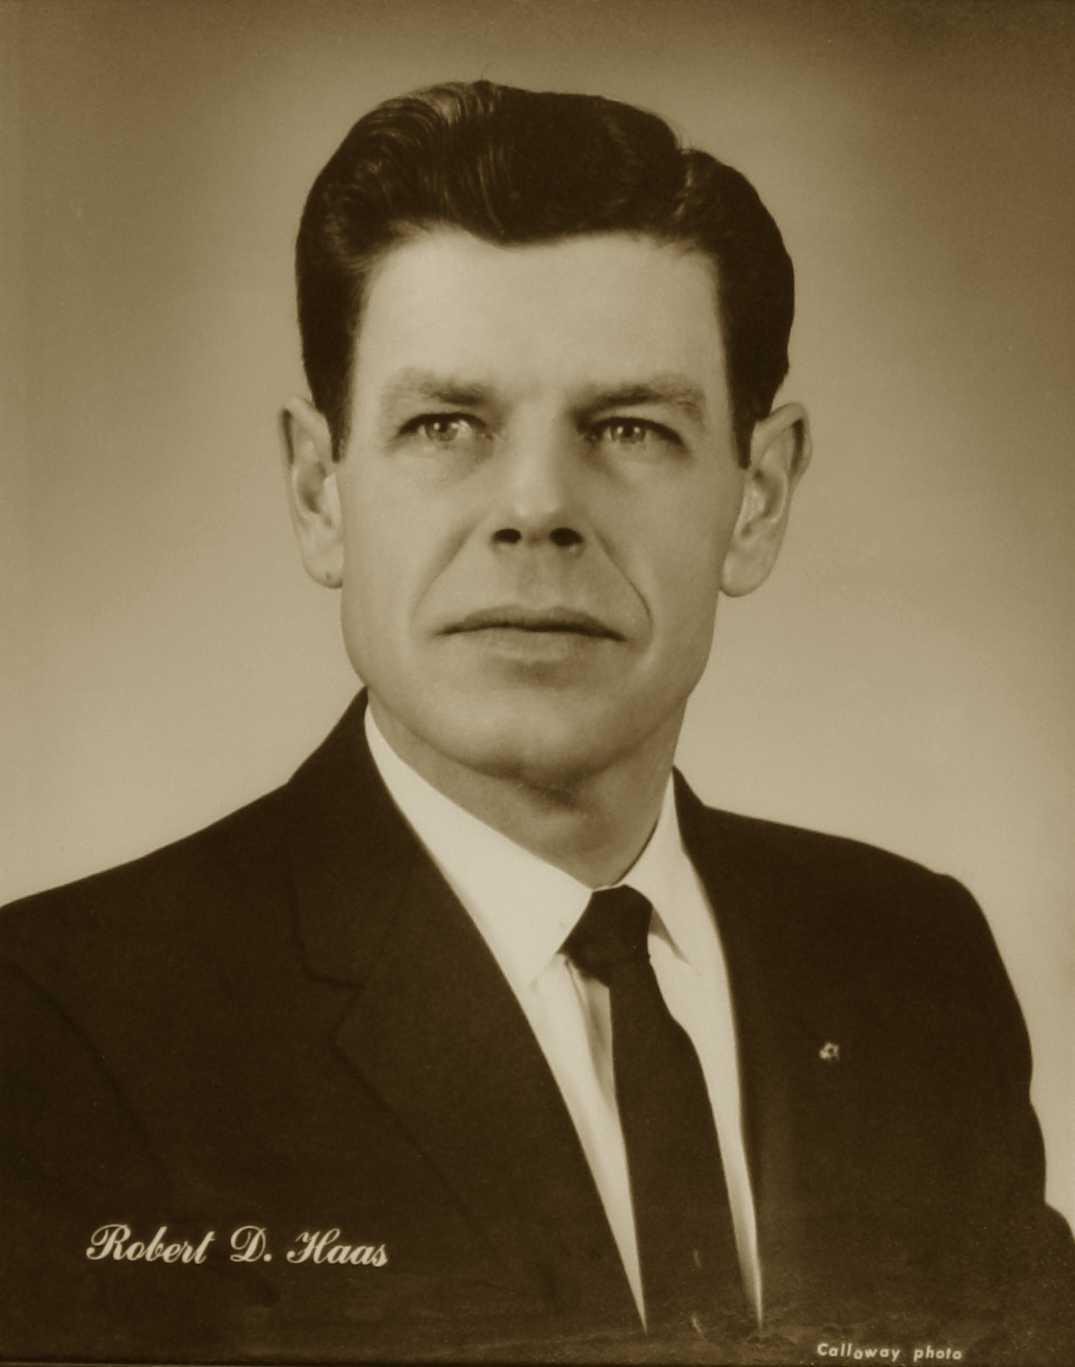 Robert D. Haas, 1966